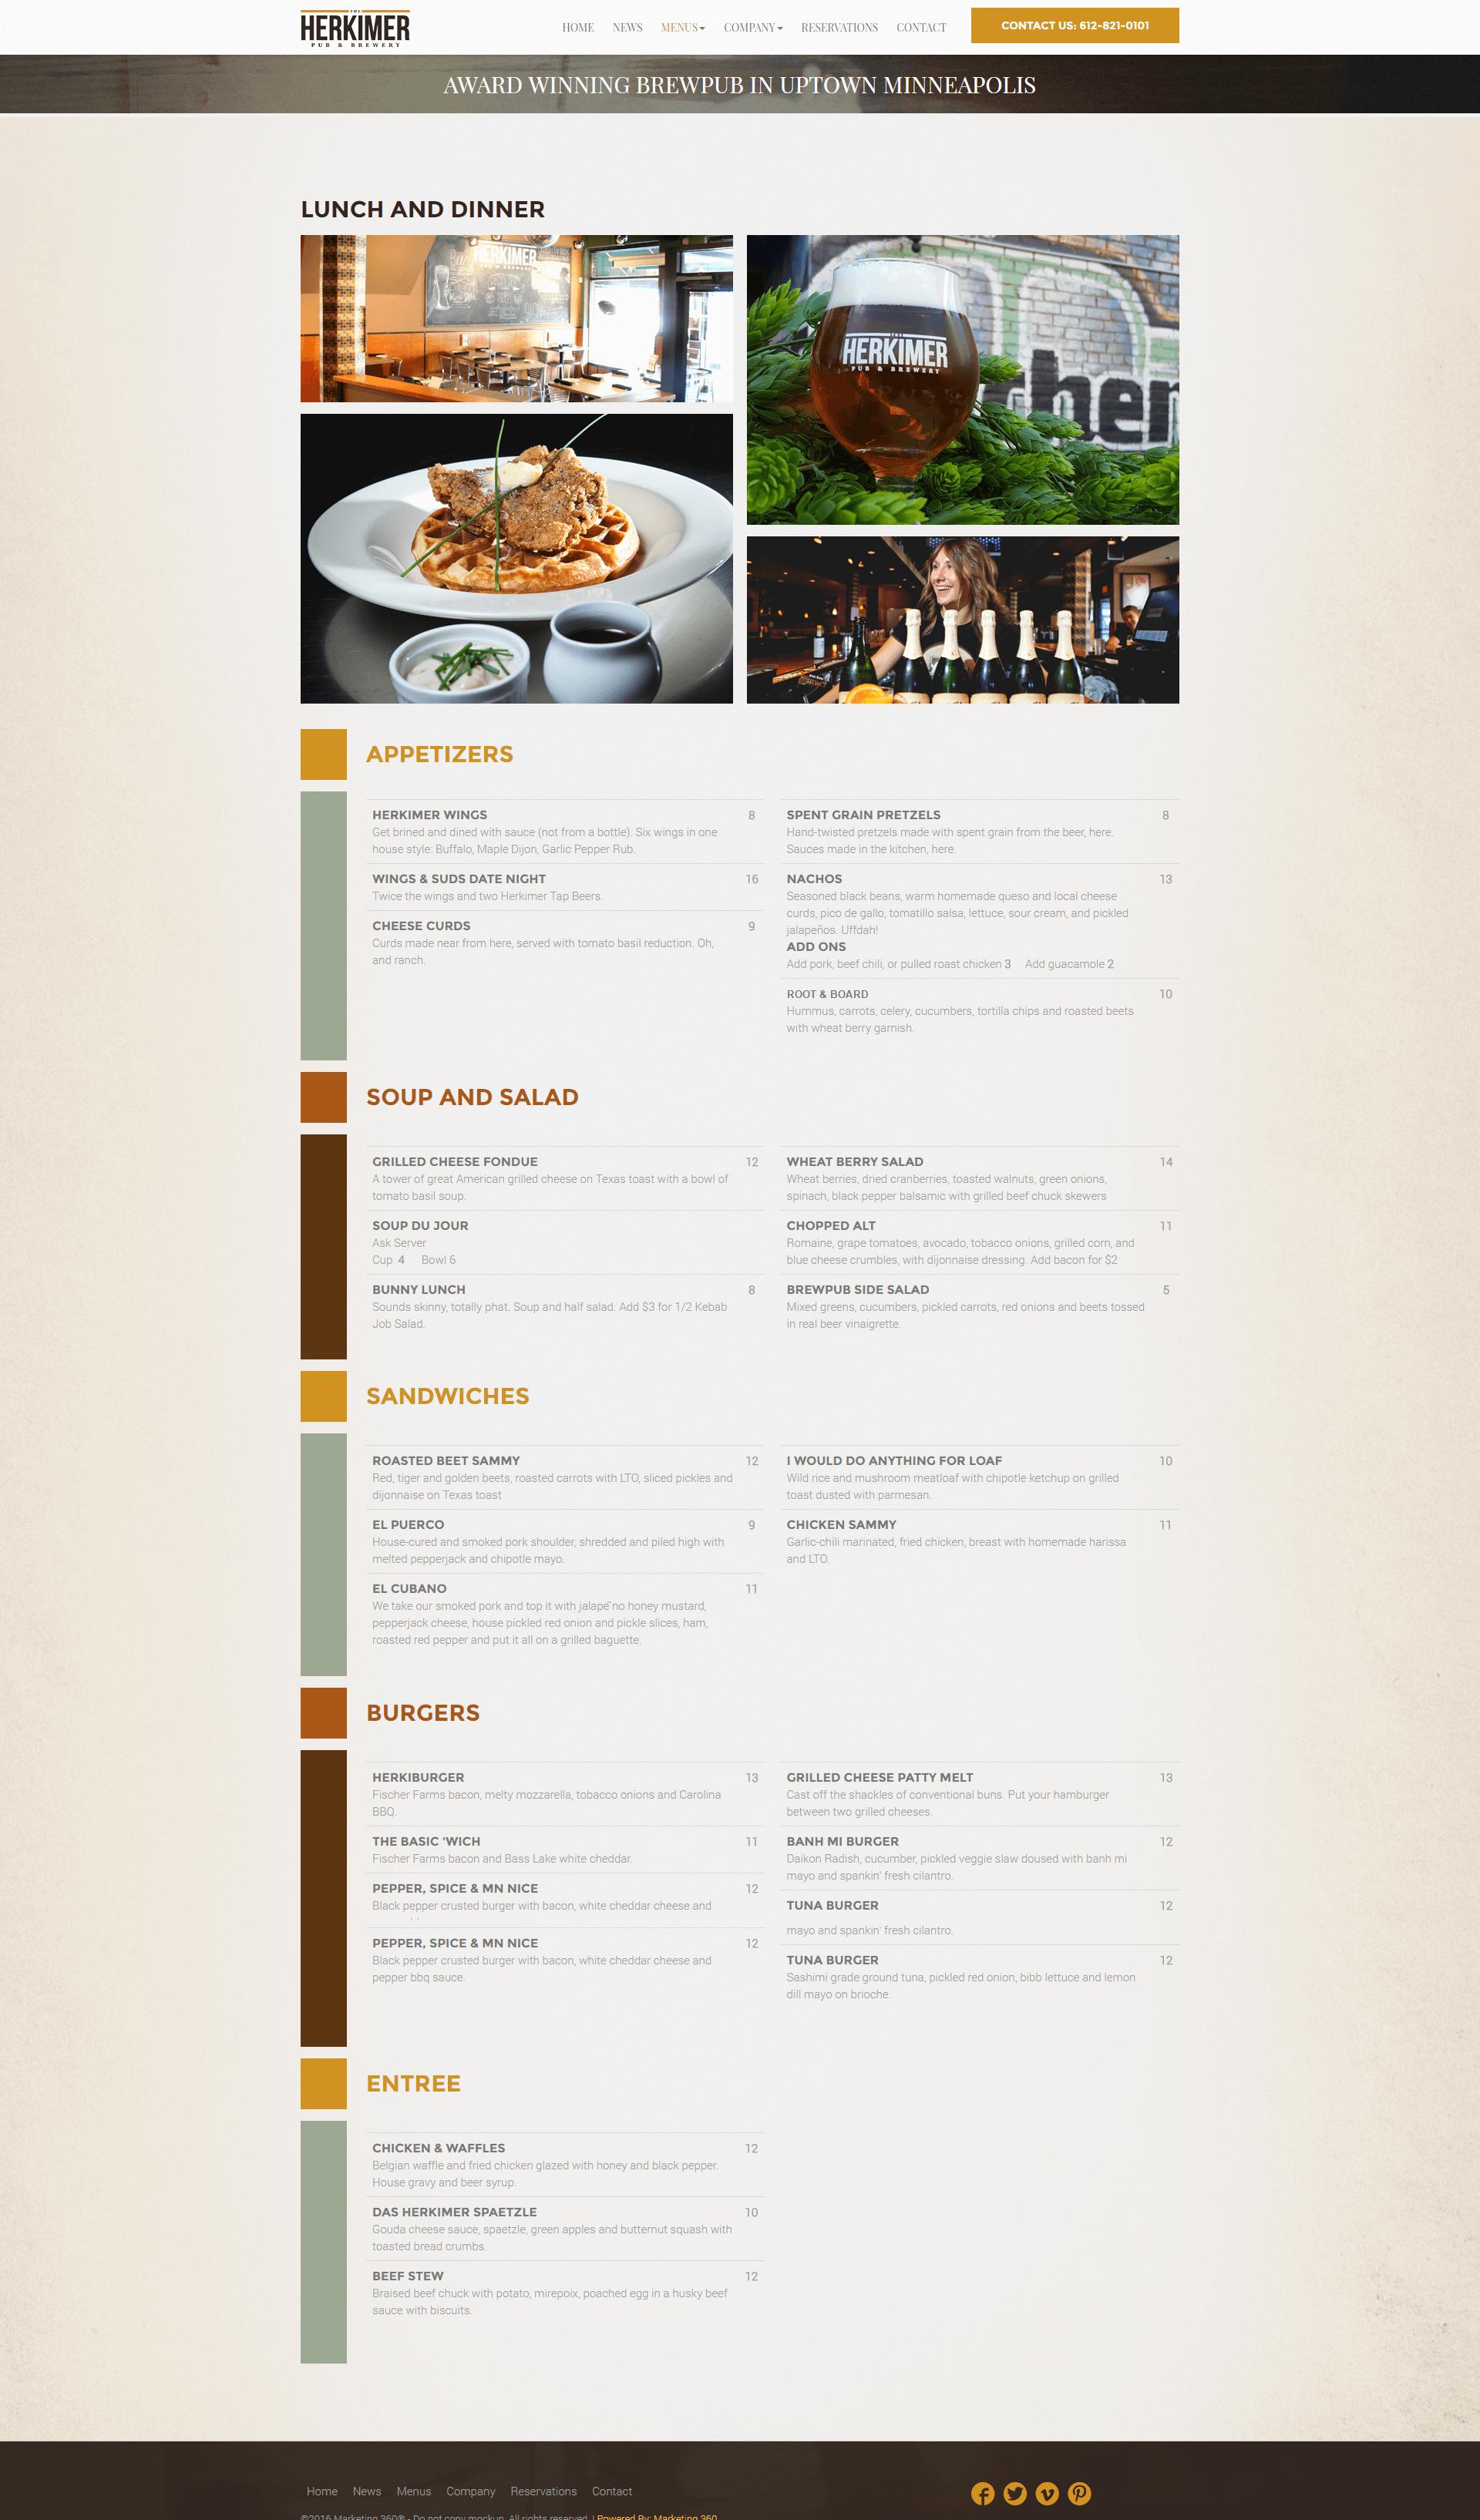 restaurant menu page